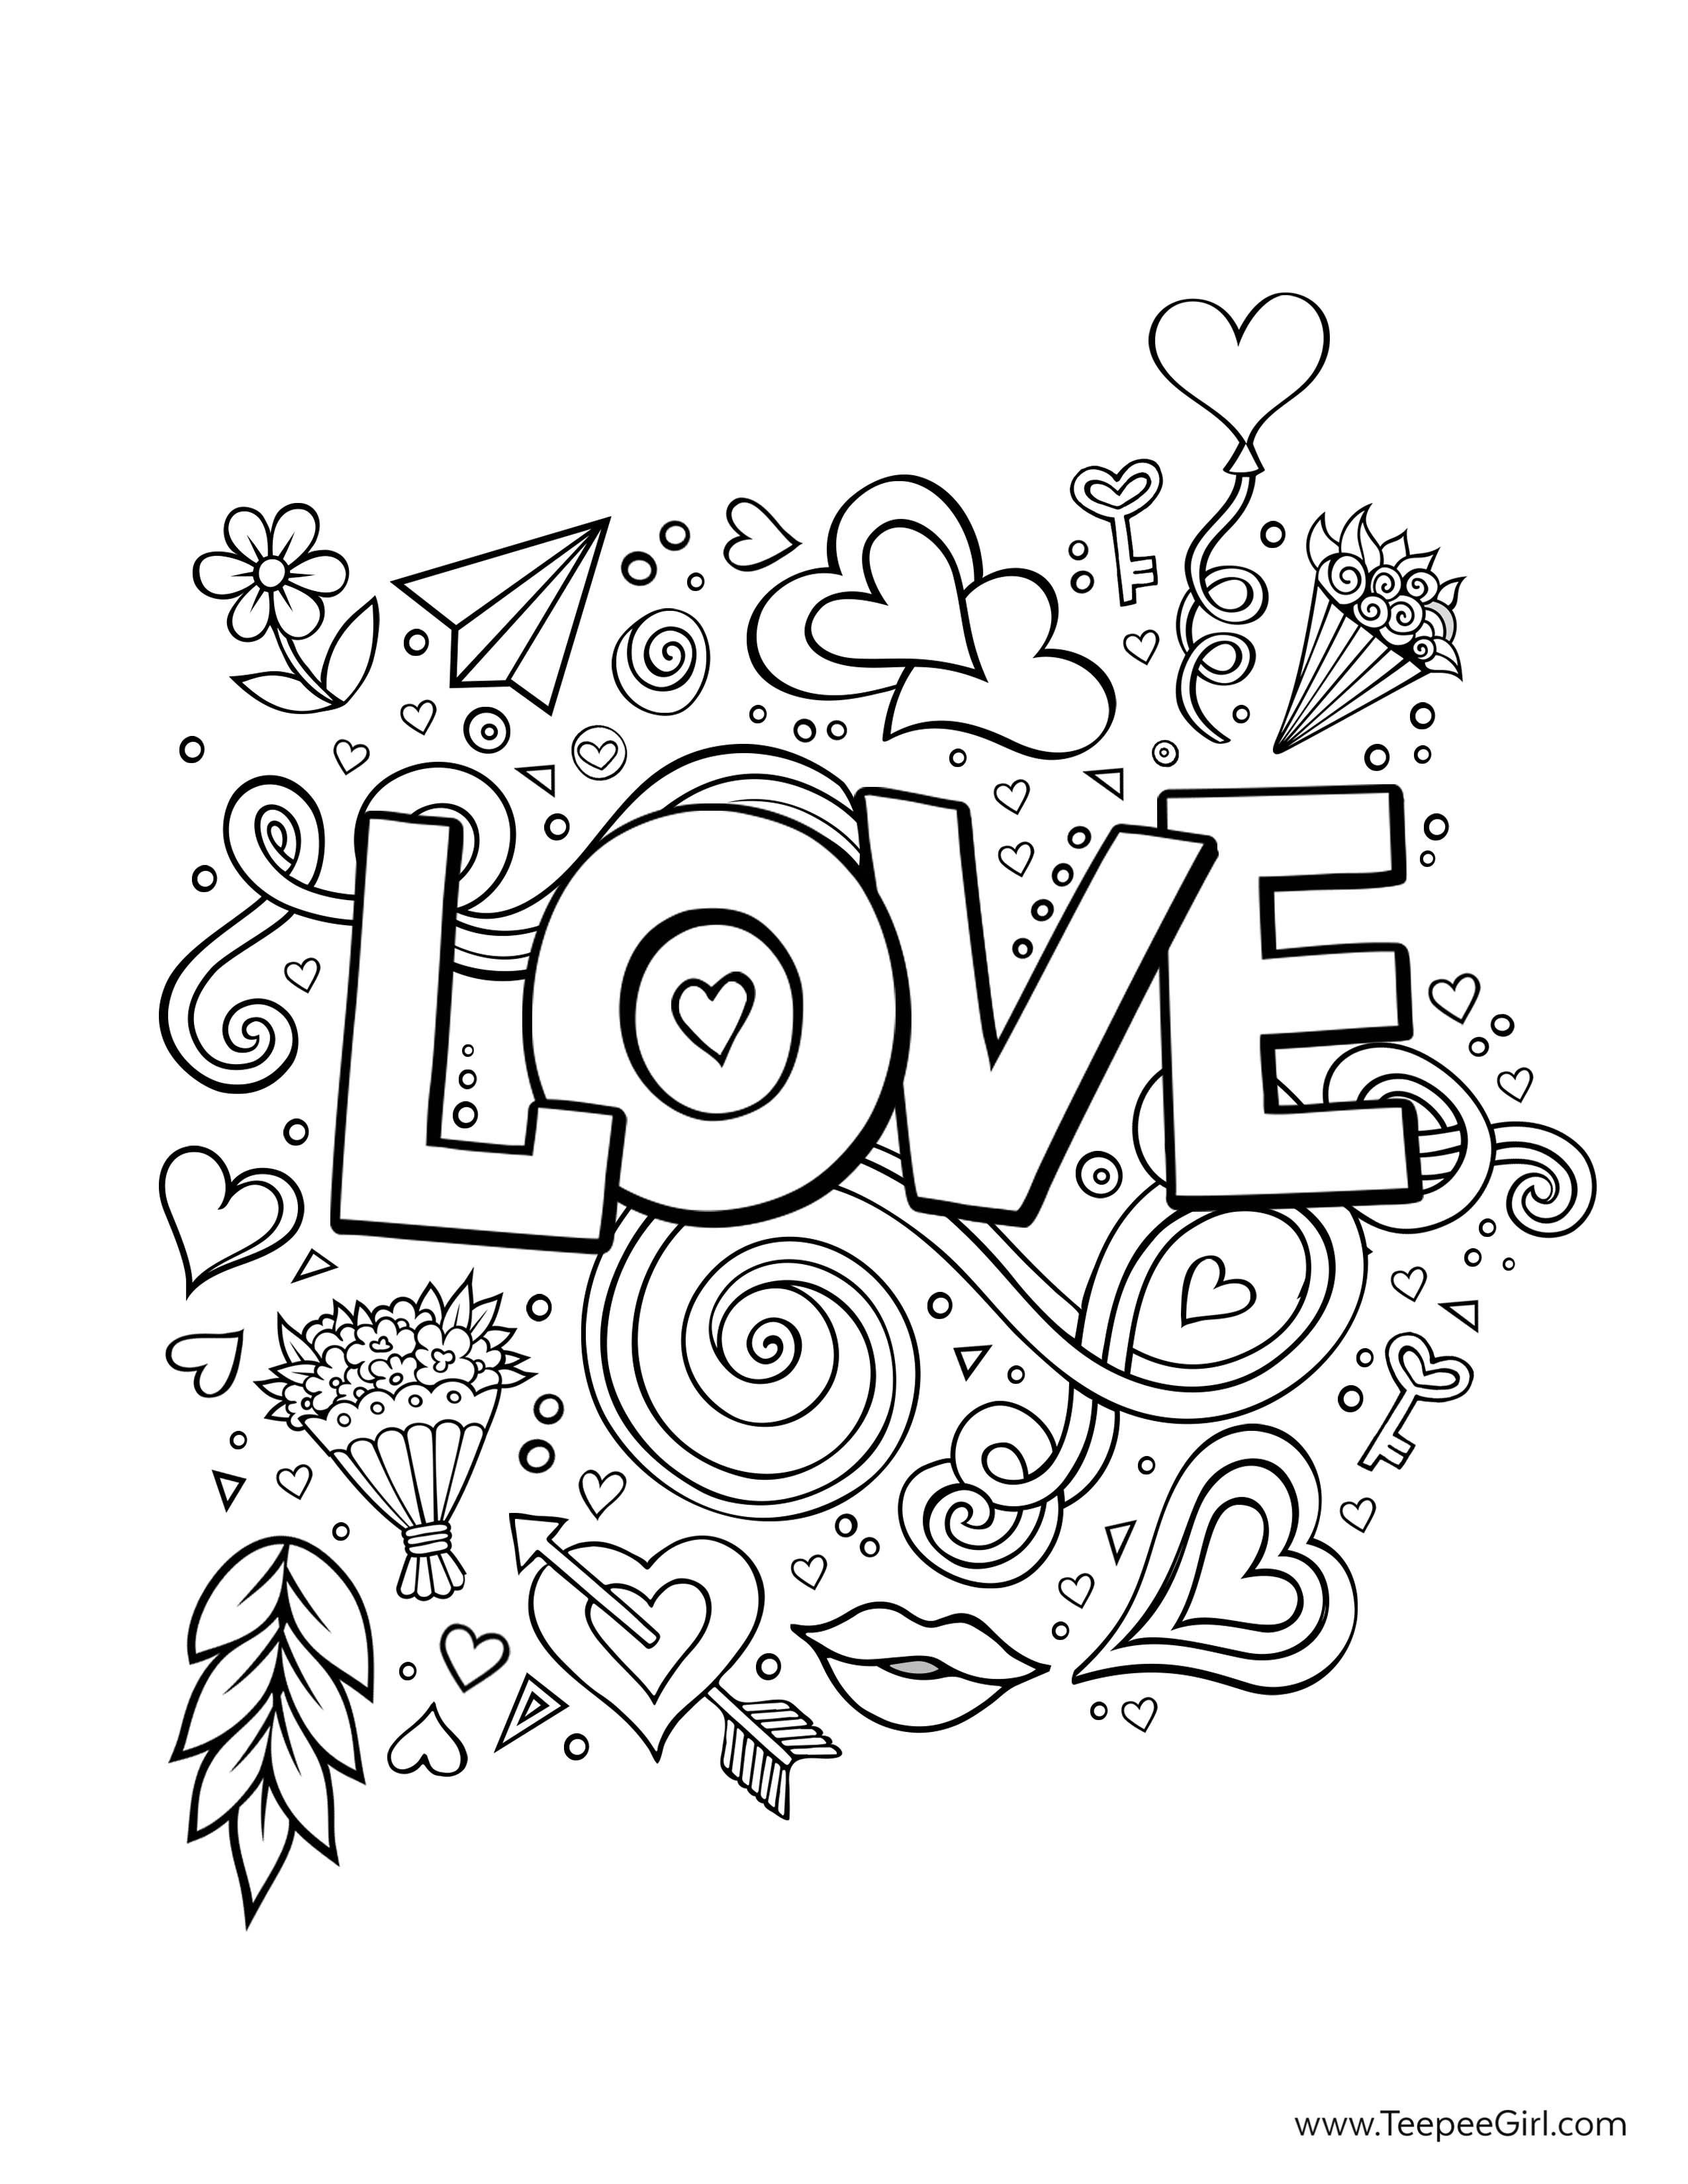 i2.wp.com teepeegirl.com wp-content uploads 2017 01 Love ...